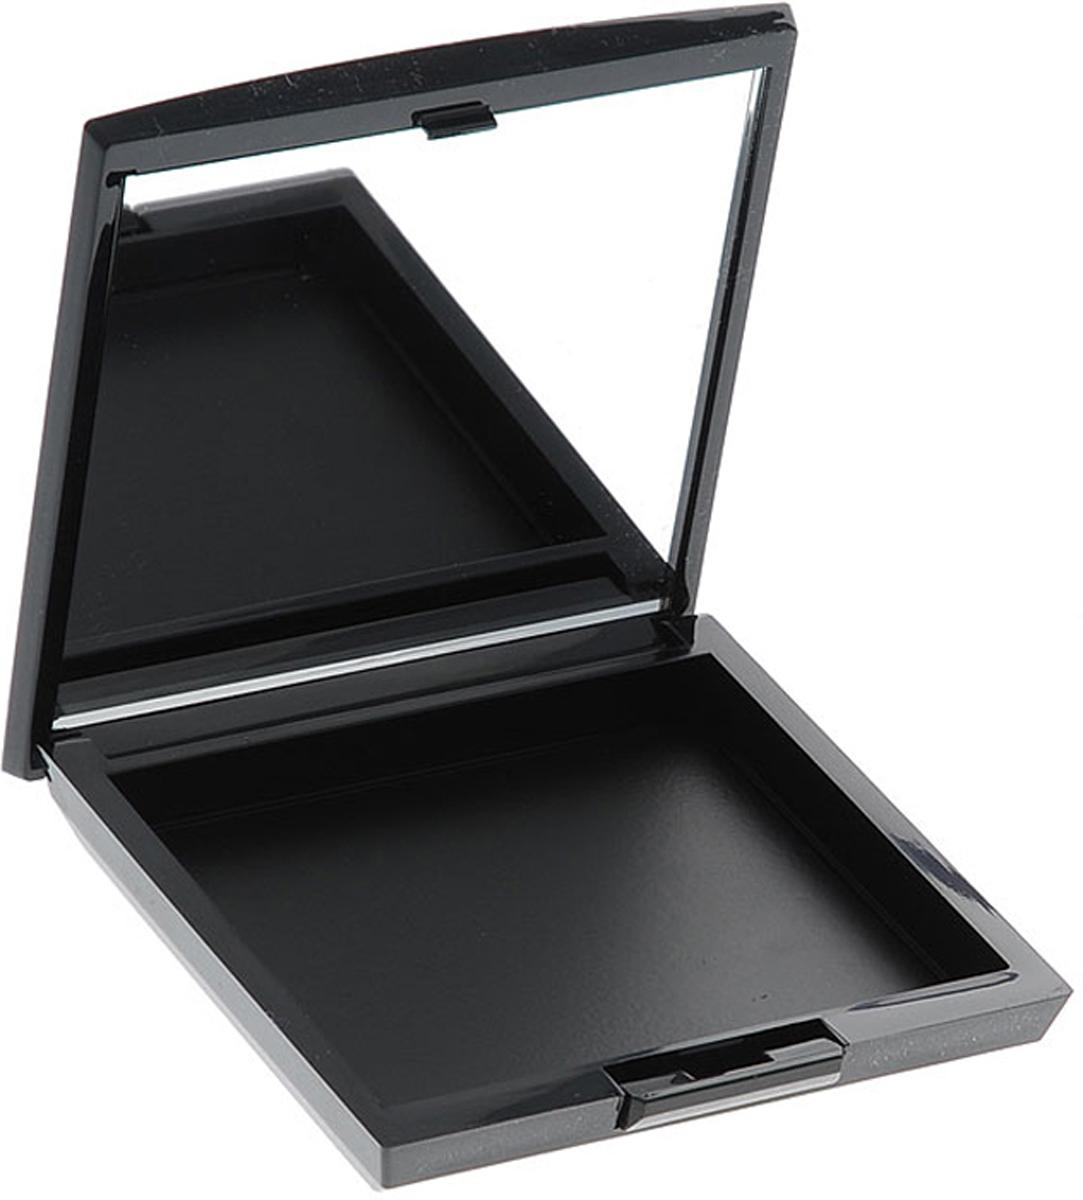 Artdeco Футляр для теней и румян Beauty Box Quadrat. 5130 косметичка artdeco beauty box duo 1 шт